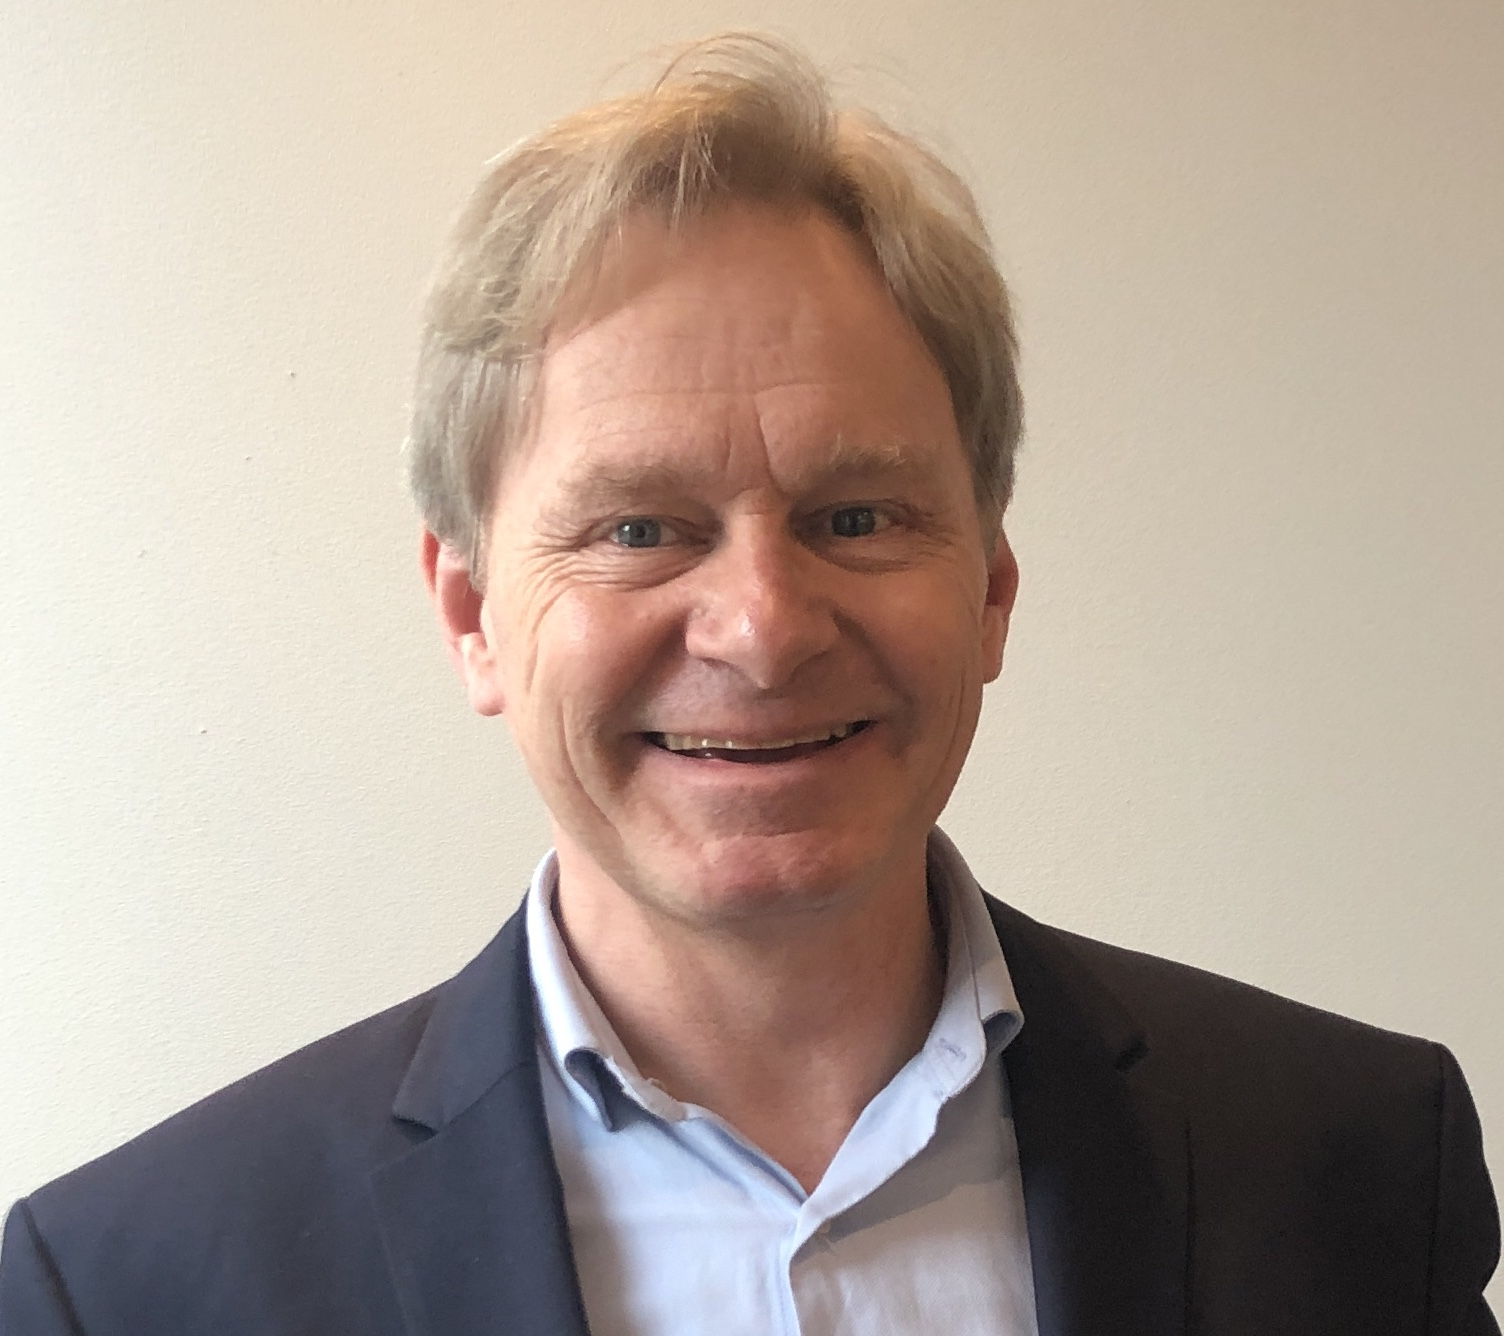 Nils Anker